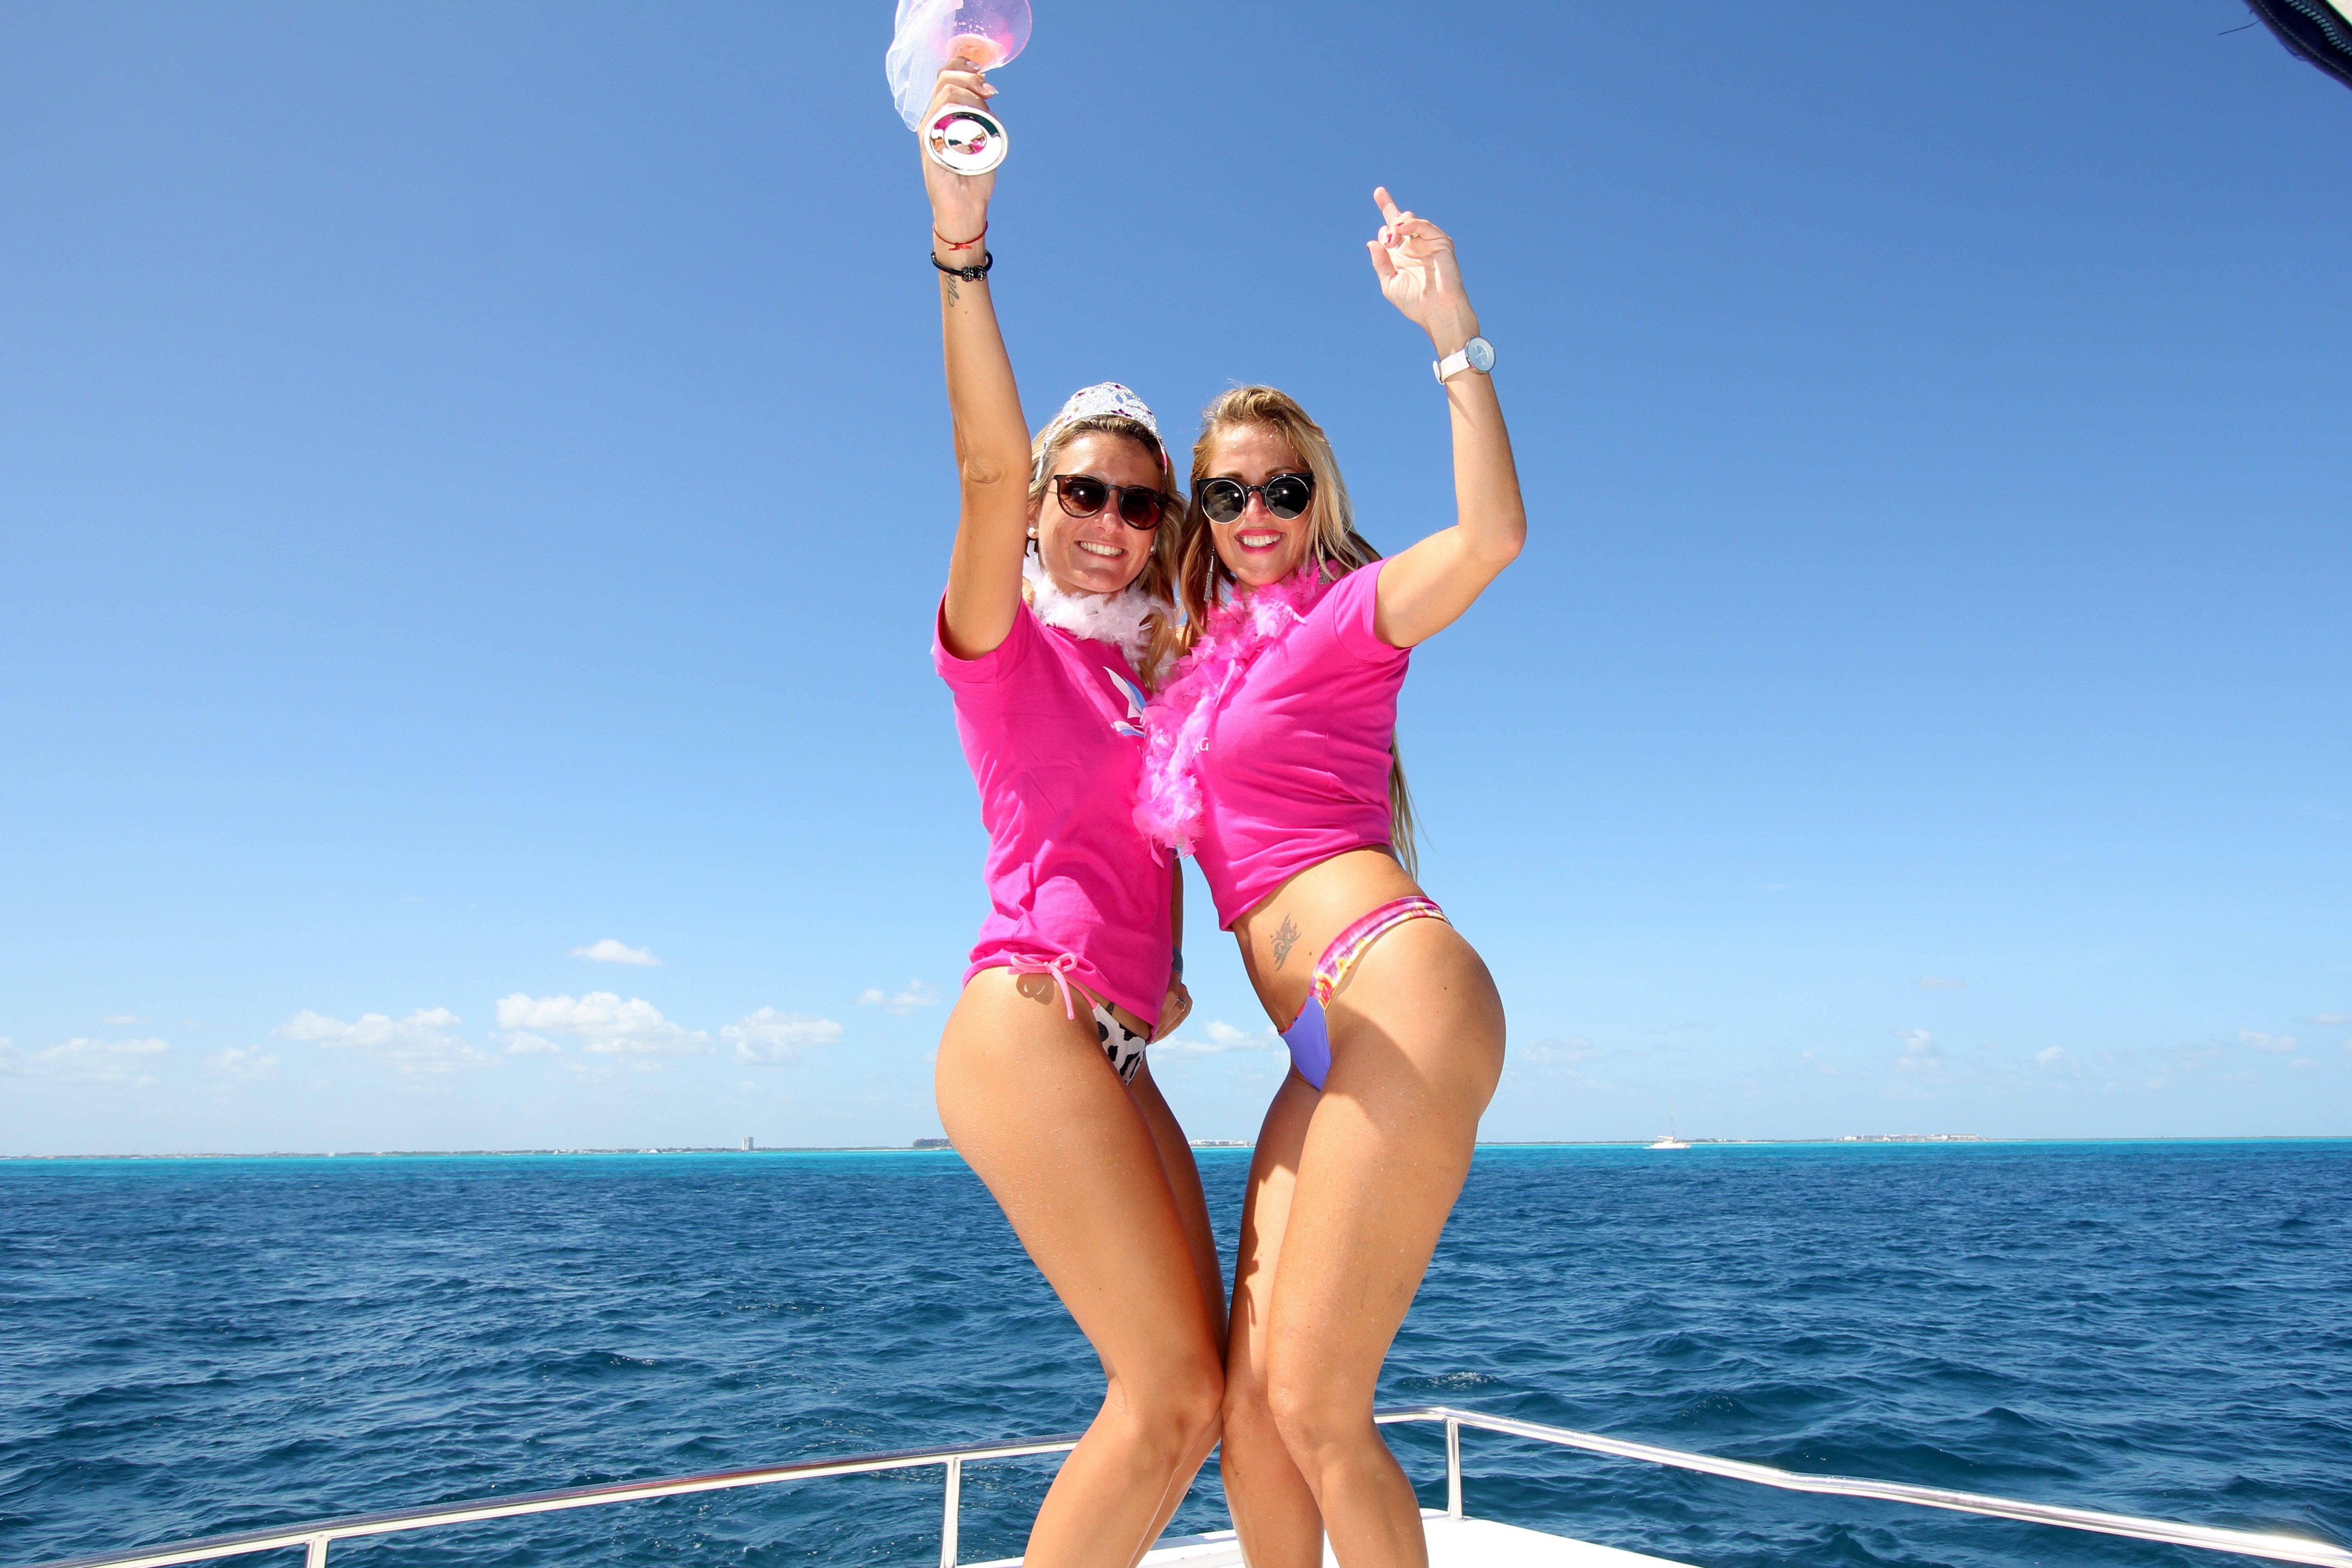 cancun bachelorette party in catamaran - isla mujeres - 12